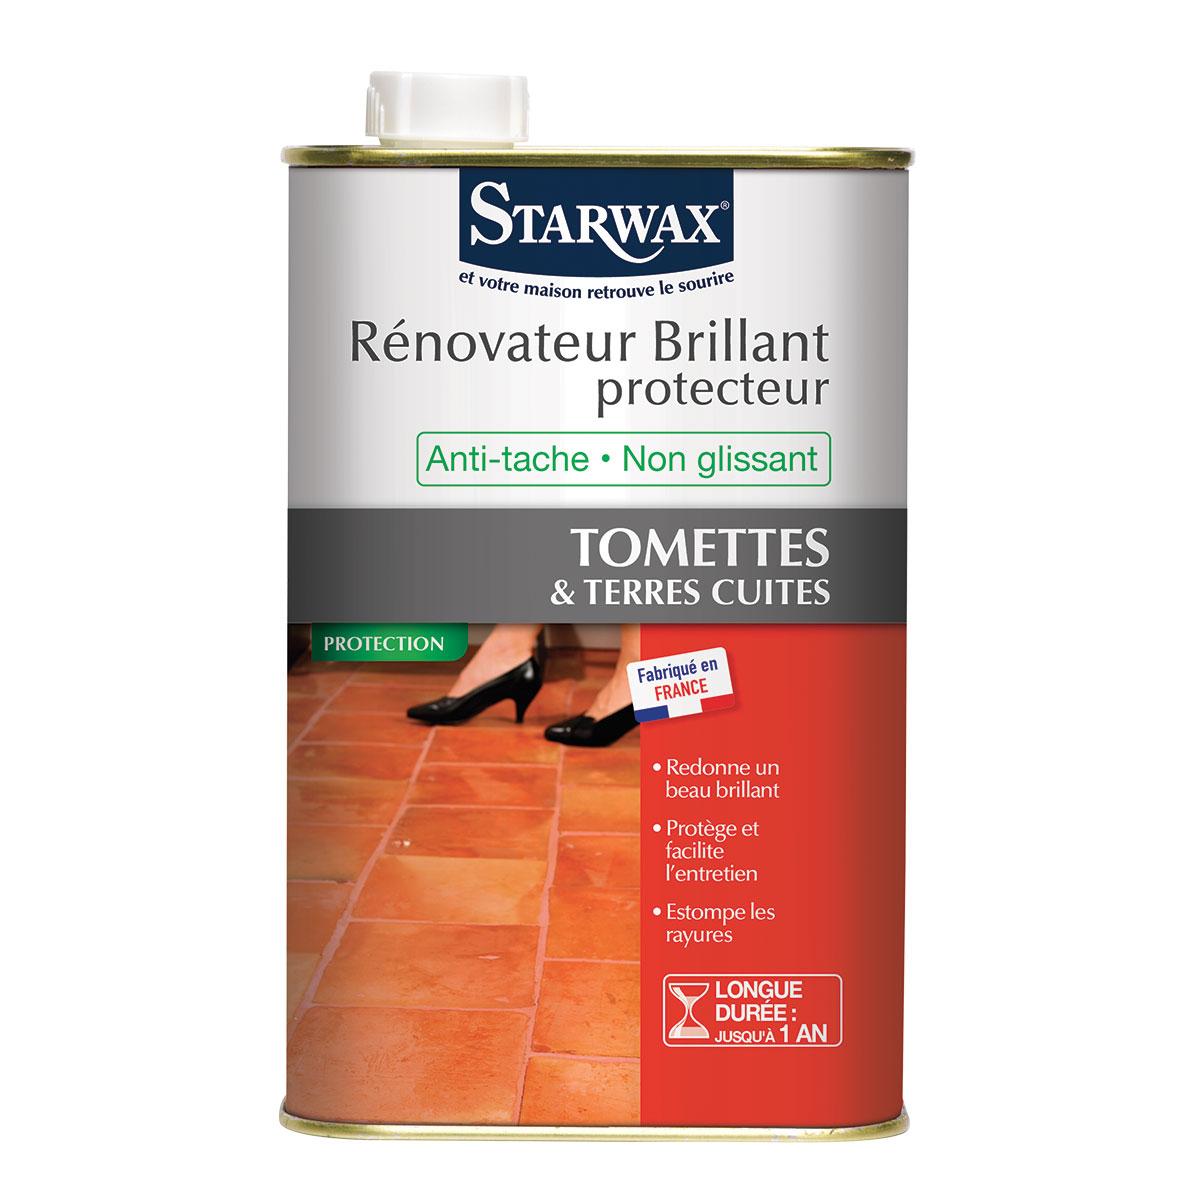 brillant protecteur tomettes terres cuites starwax